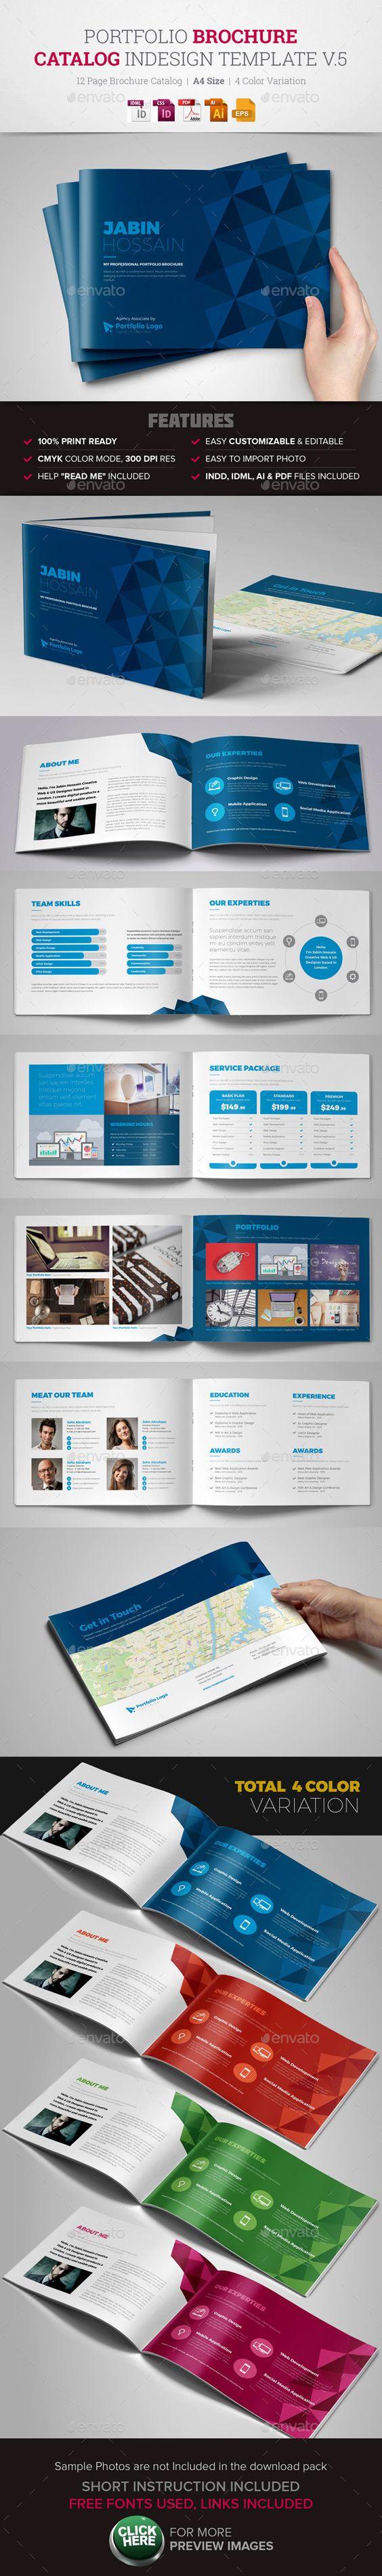 Portfolio Brochure InDesign Template #design Buy Now: http://graphicriver.net/item/portfolio-brochure-indesign-template-v5-/12858255?ref=ksioks: